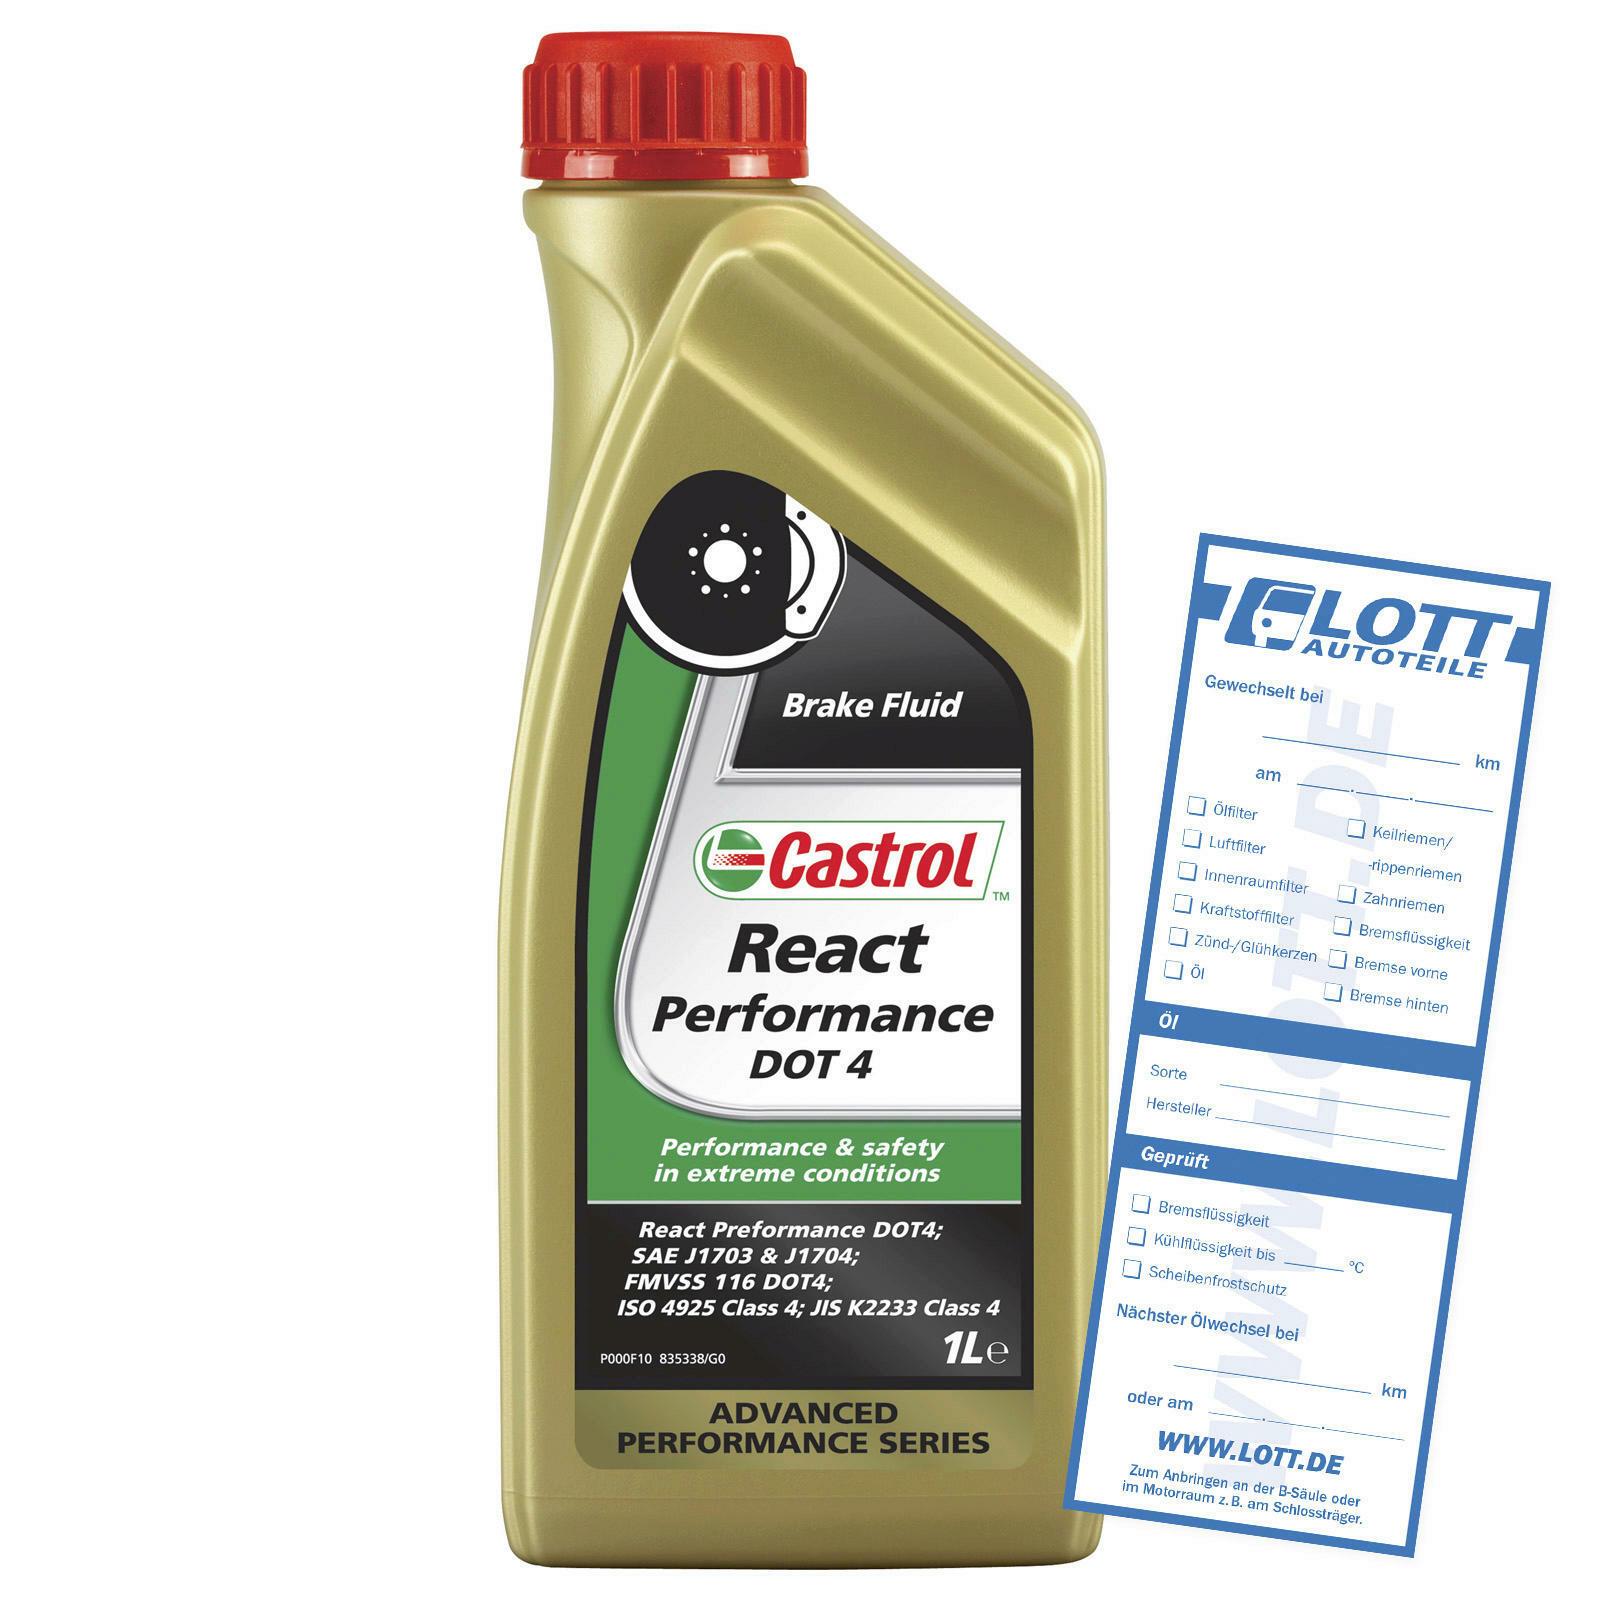 CASTROL Bremsflüssigkeit React Performance DOT 4 1L